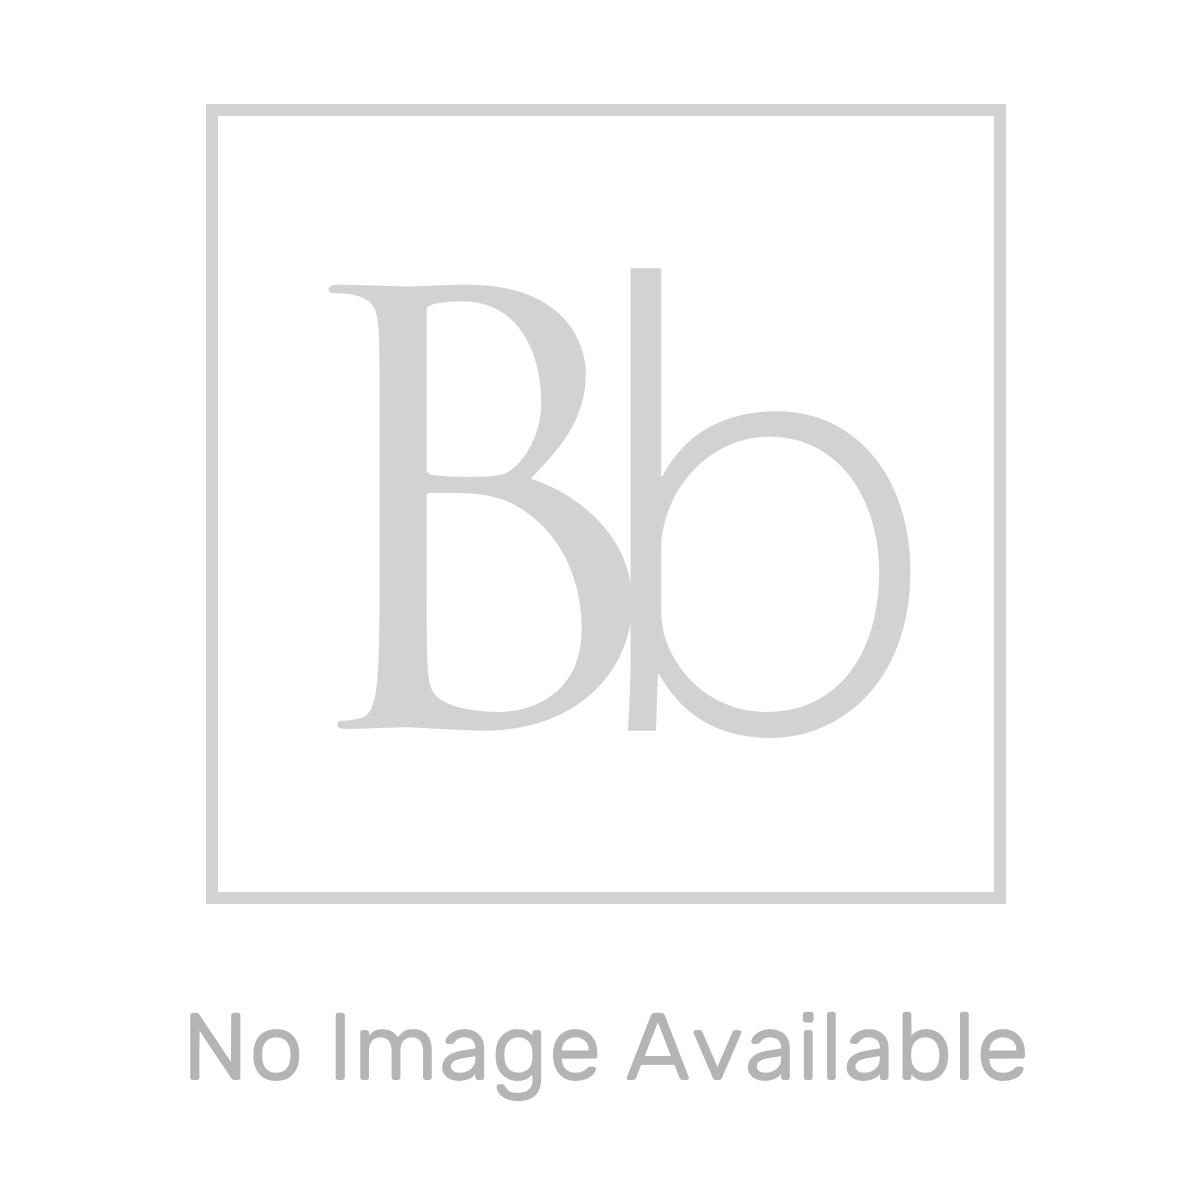 Aquadart Black Slate Shower Tray 1400 x 760 Dimension